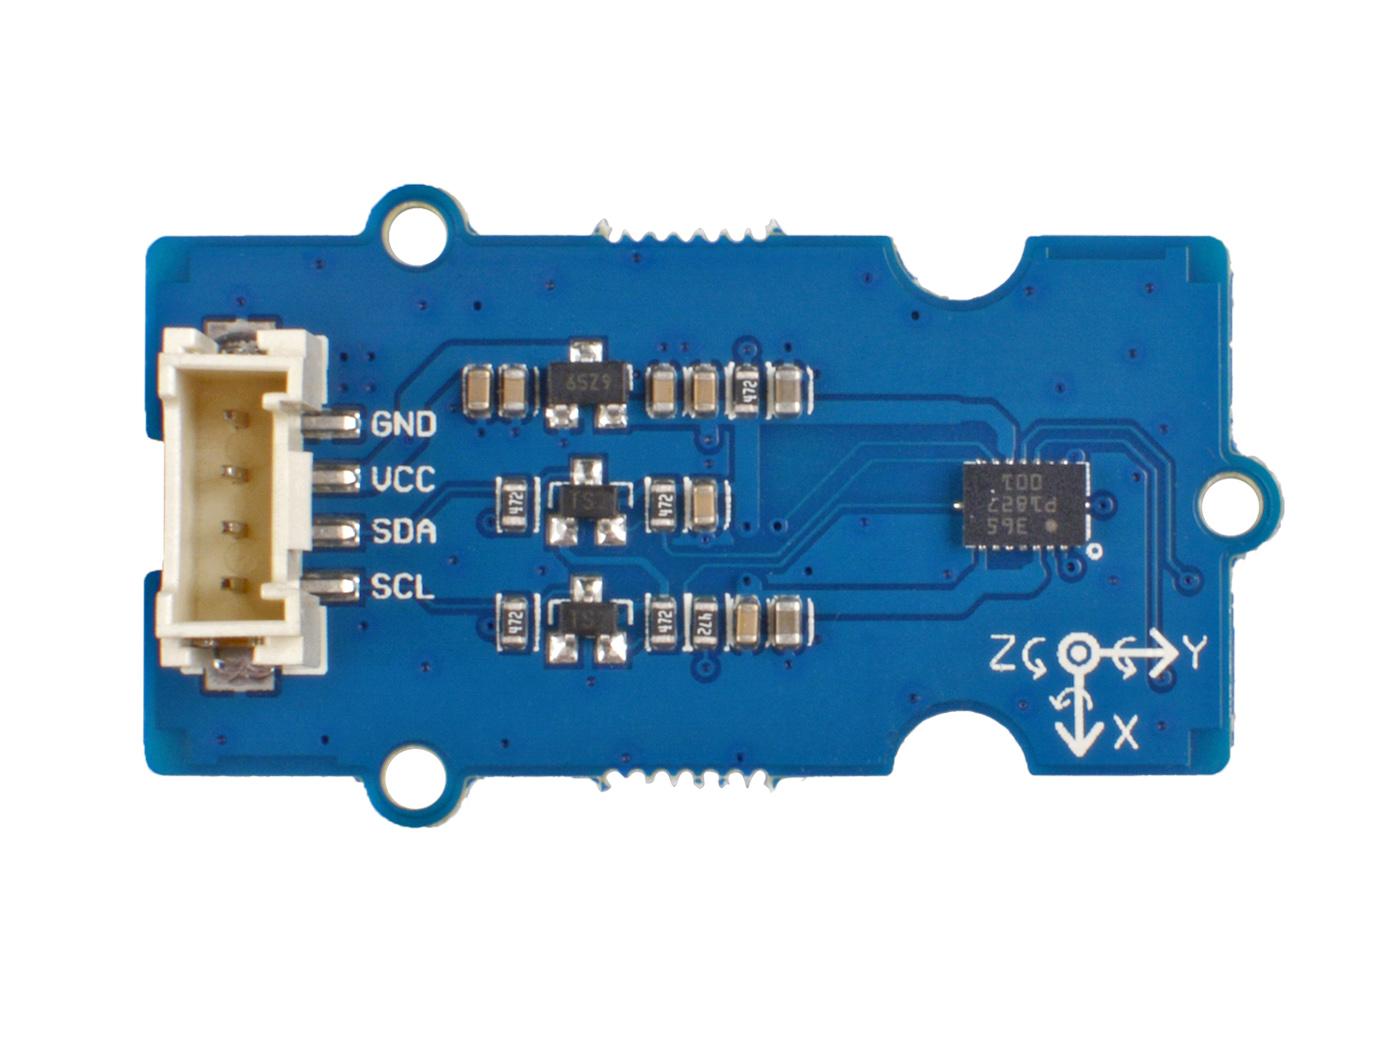 Grove - 6-Axis Accelerometer&Gyroscope (BMI088)